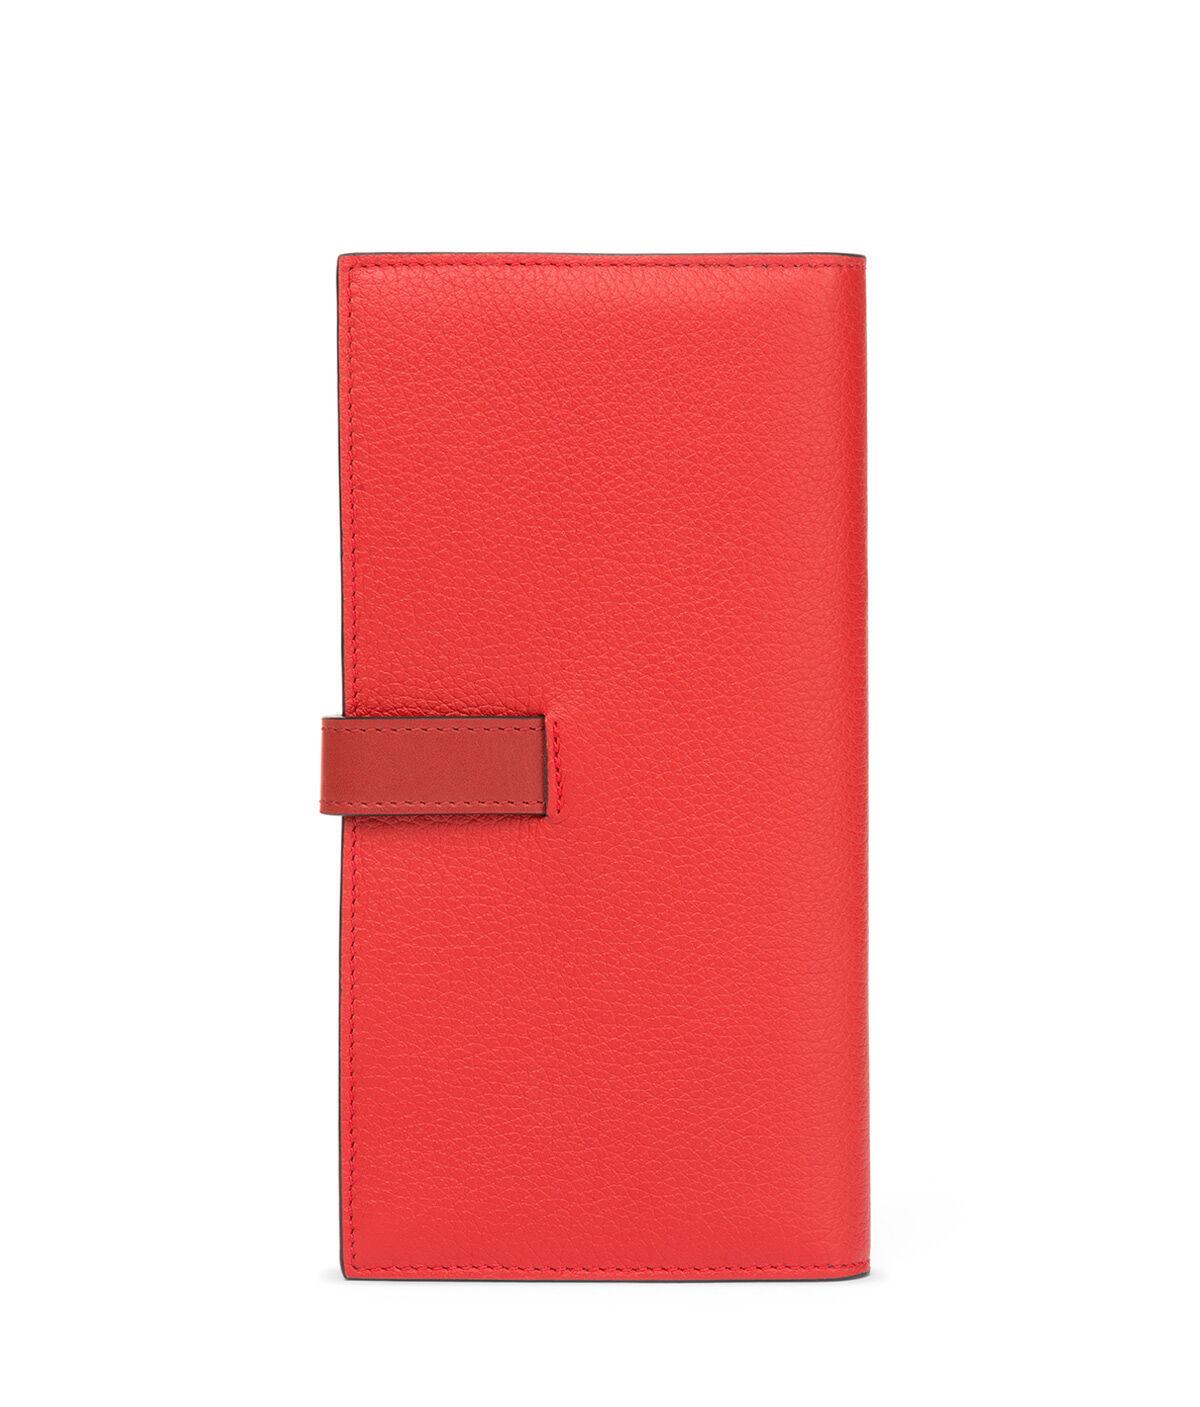 LOEWE Billetero Largo Vertical Rojo Escarlata/Rojo Teja all